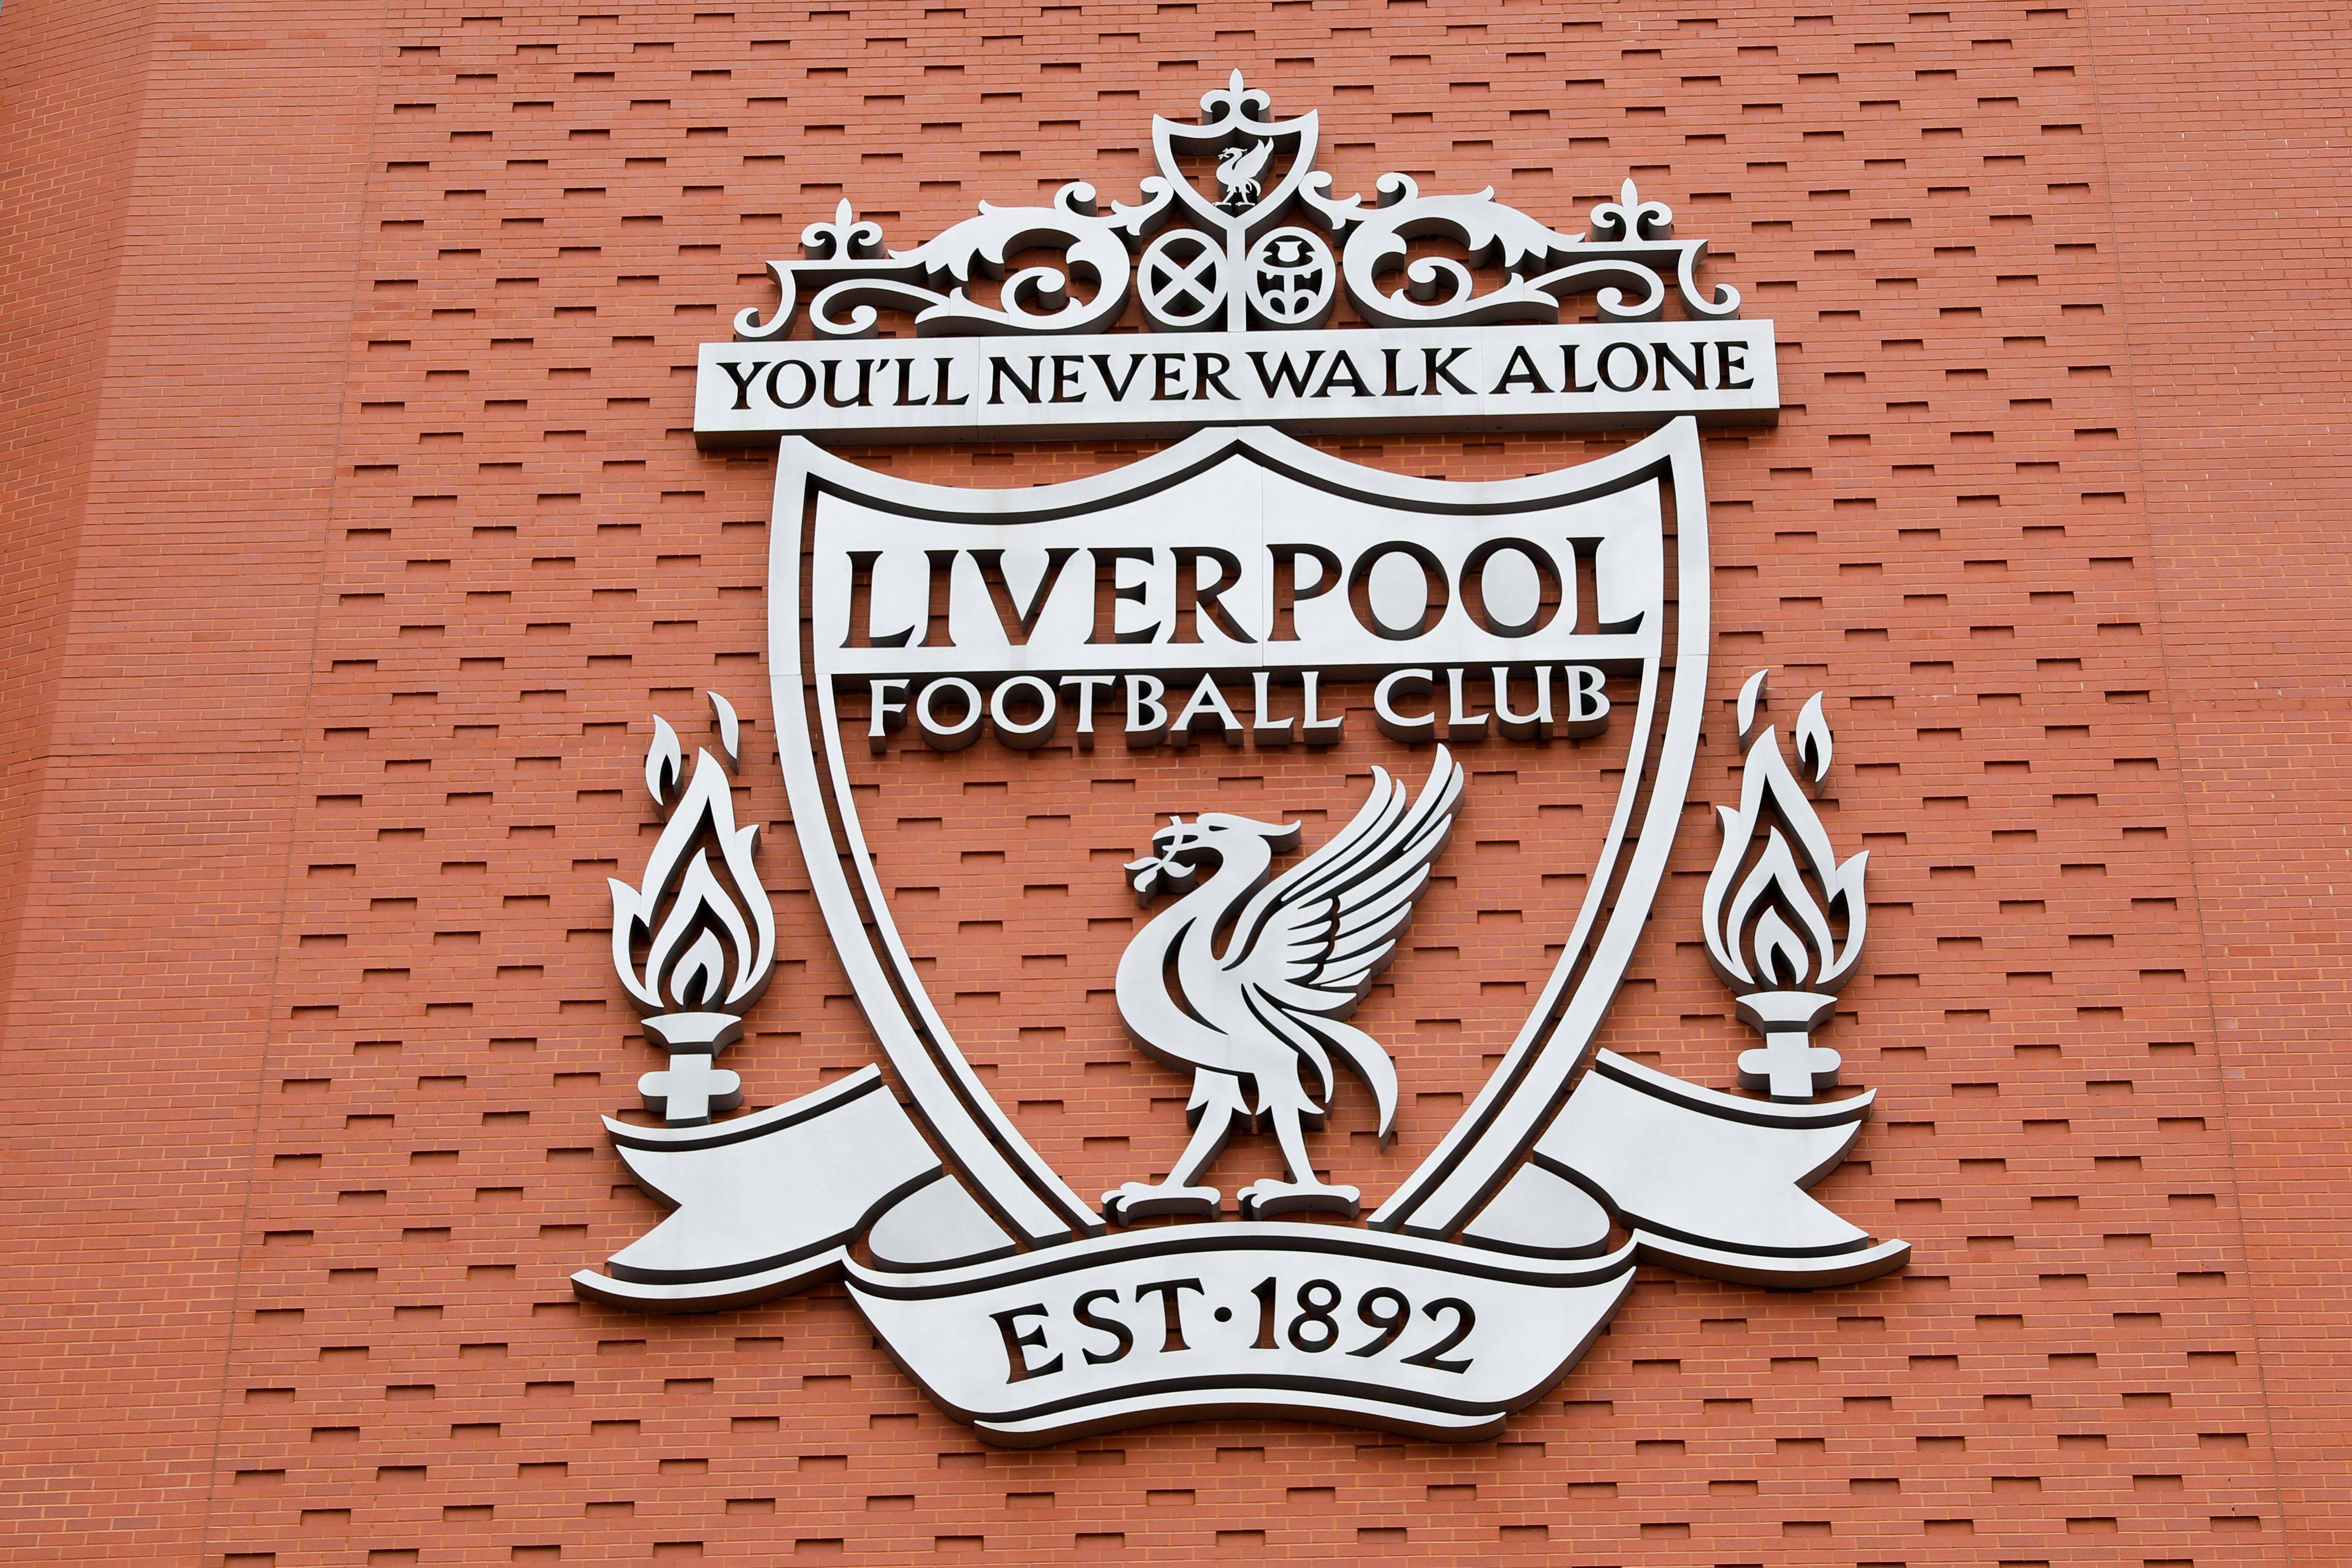 Premier League Fc Liverpool Feiert Sechsten Sieg Im Sechsten Spiel